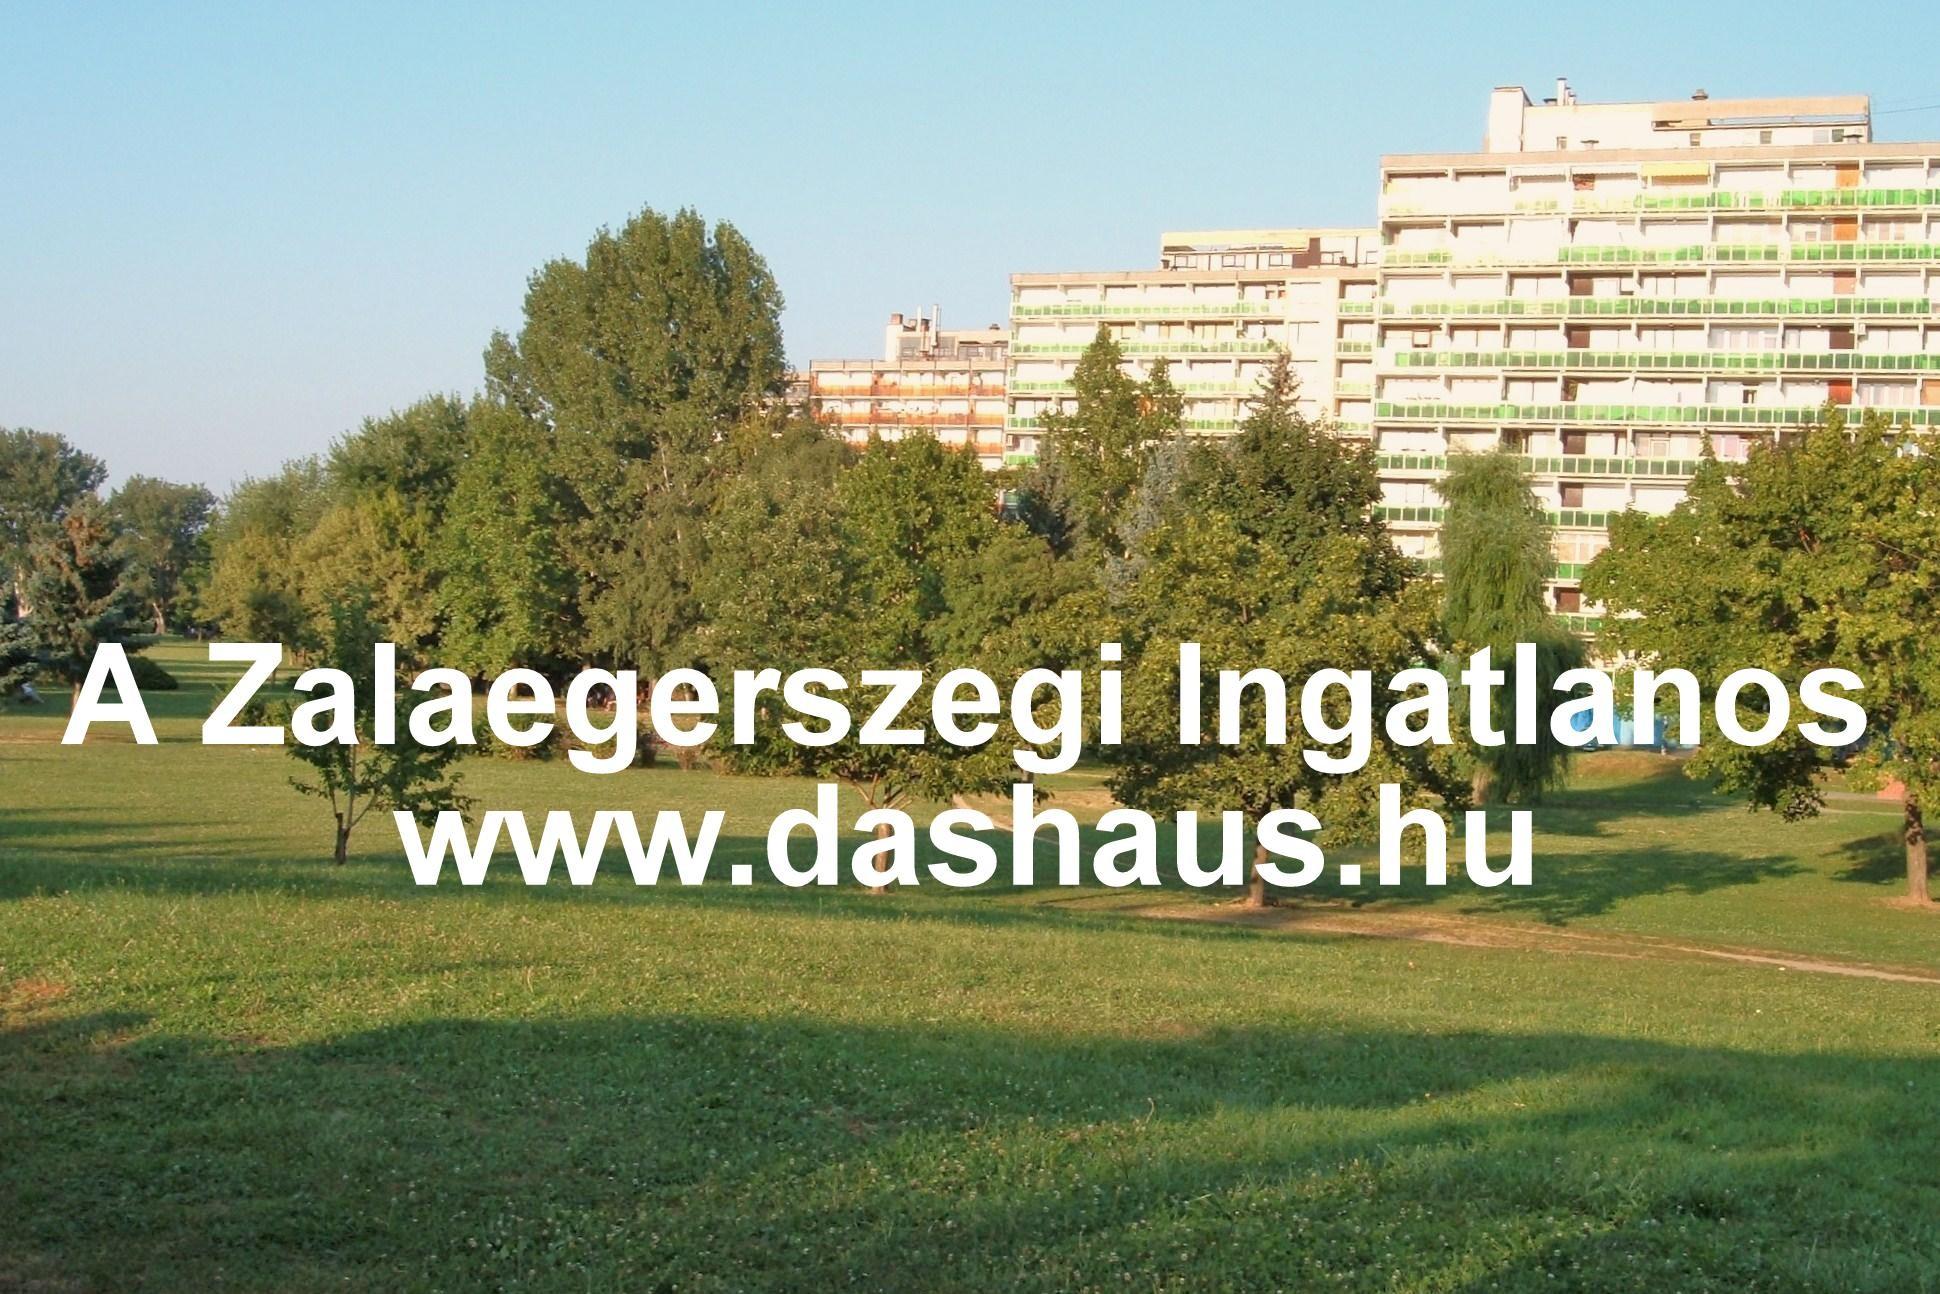 Eladó Ingatlan Zalaegerszeg - www.dashaus.hu